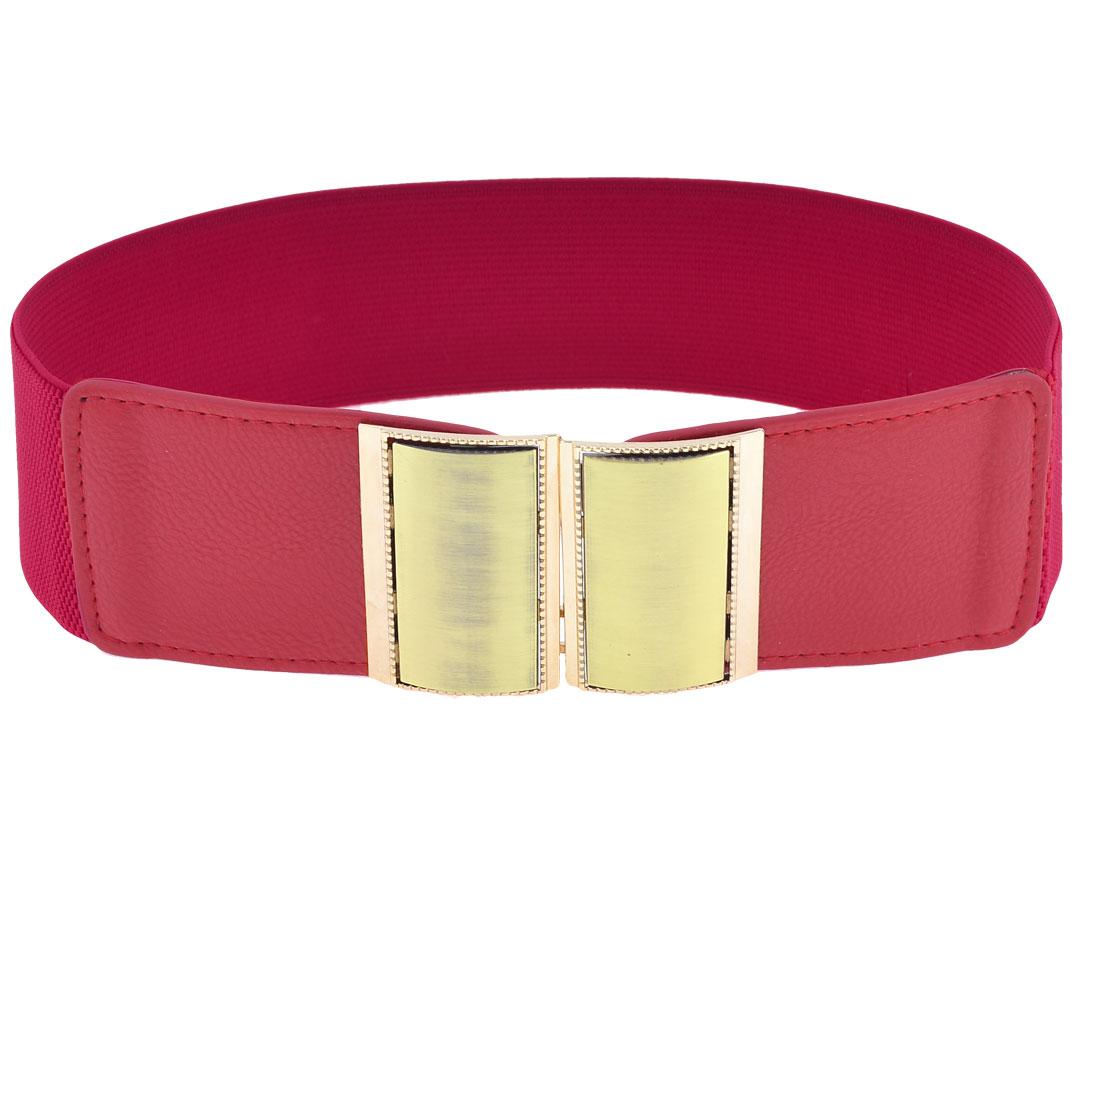 Woman Gold Tone Rectangle Interlocking Buckle Decor Cinch Waist Belt Band Red